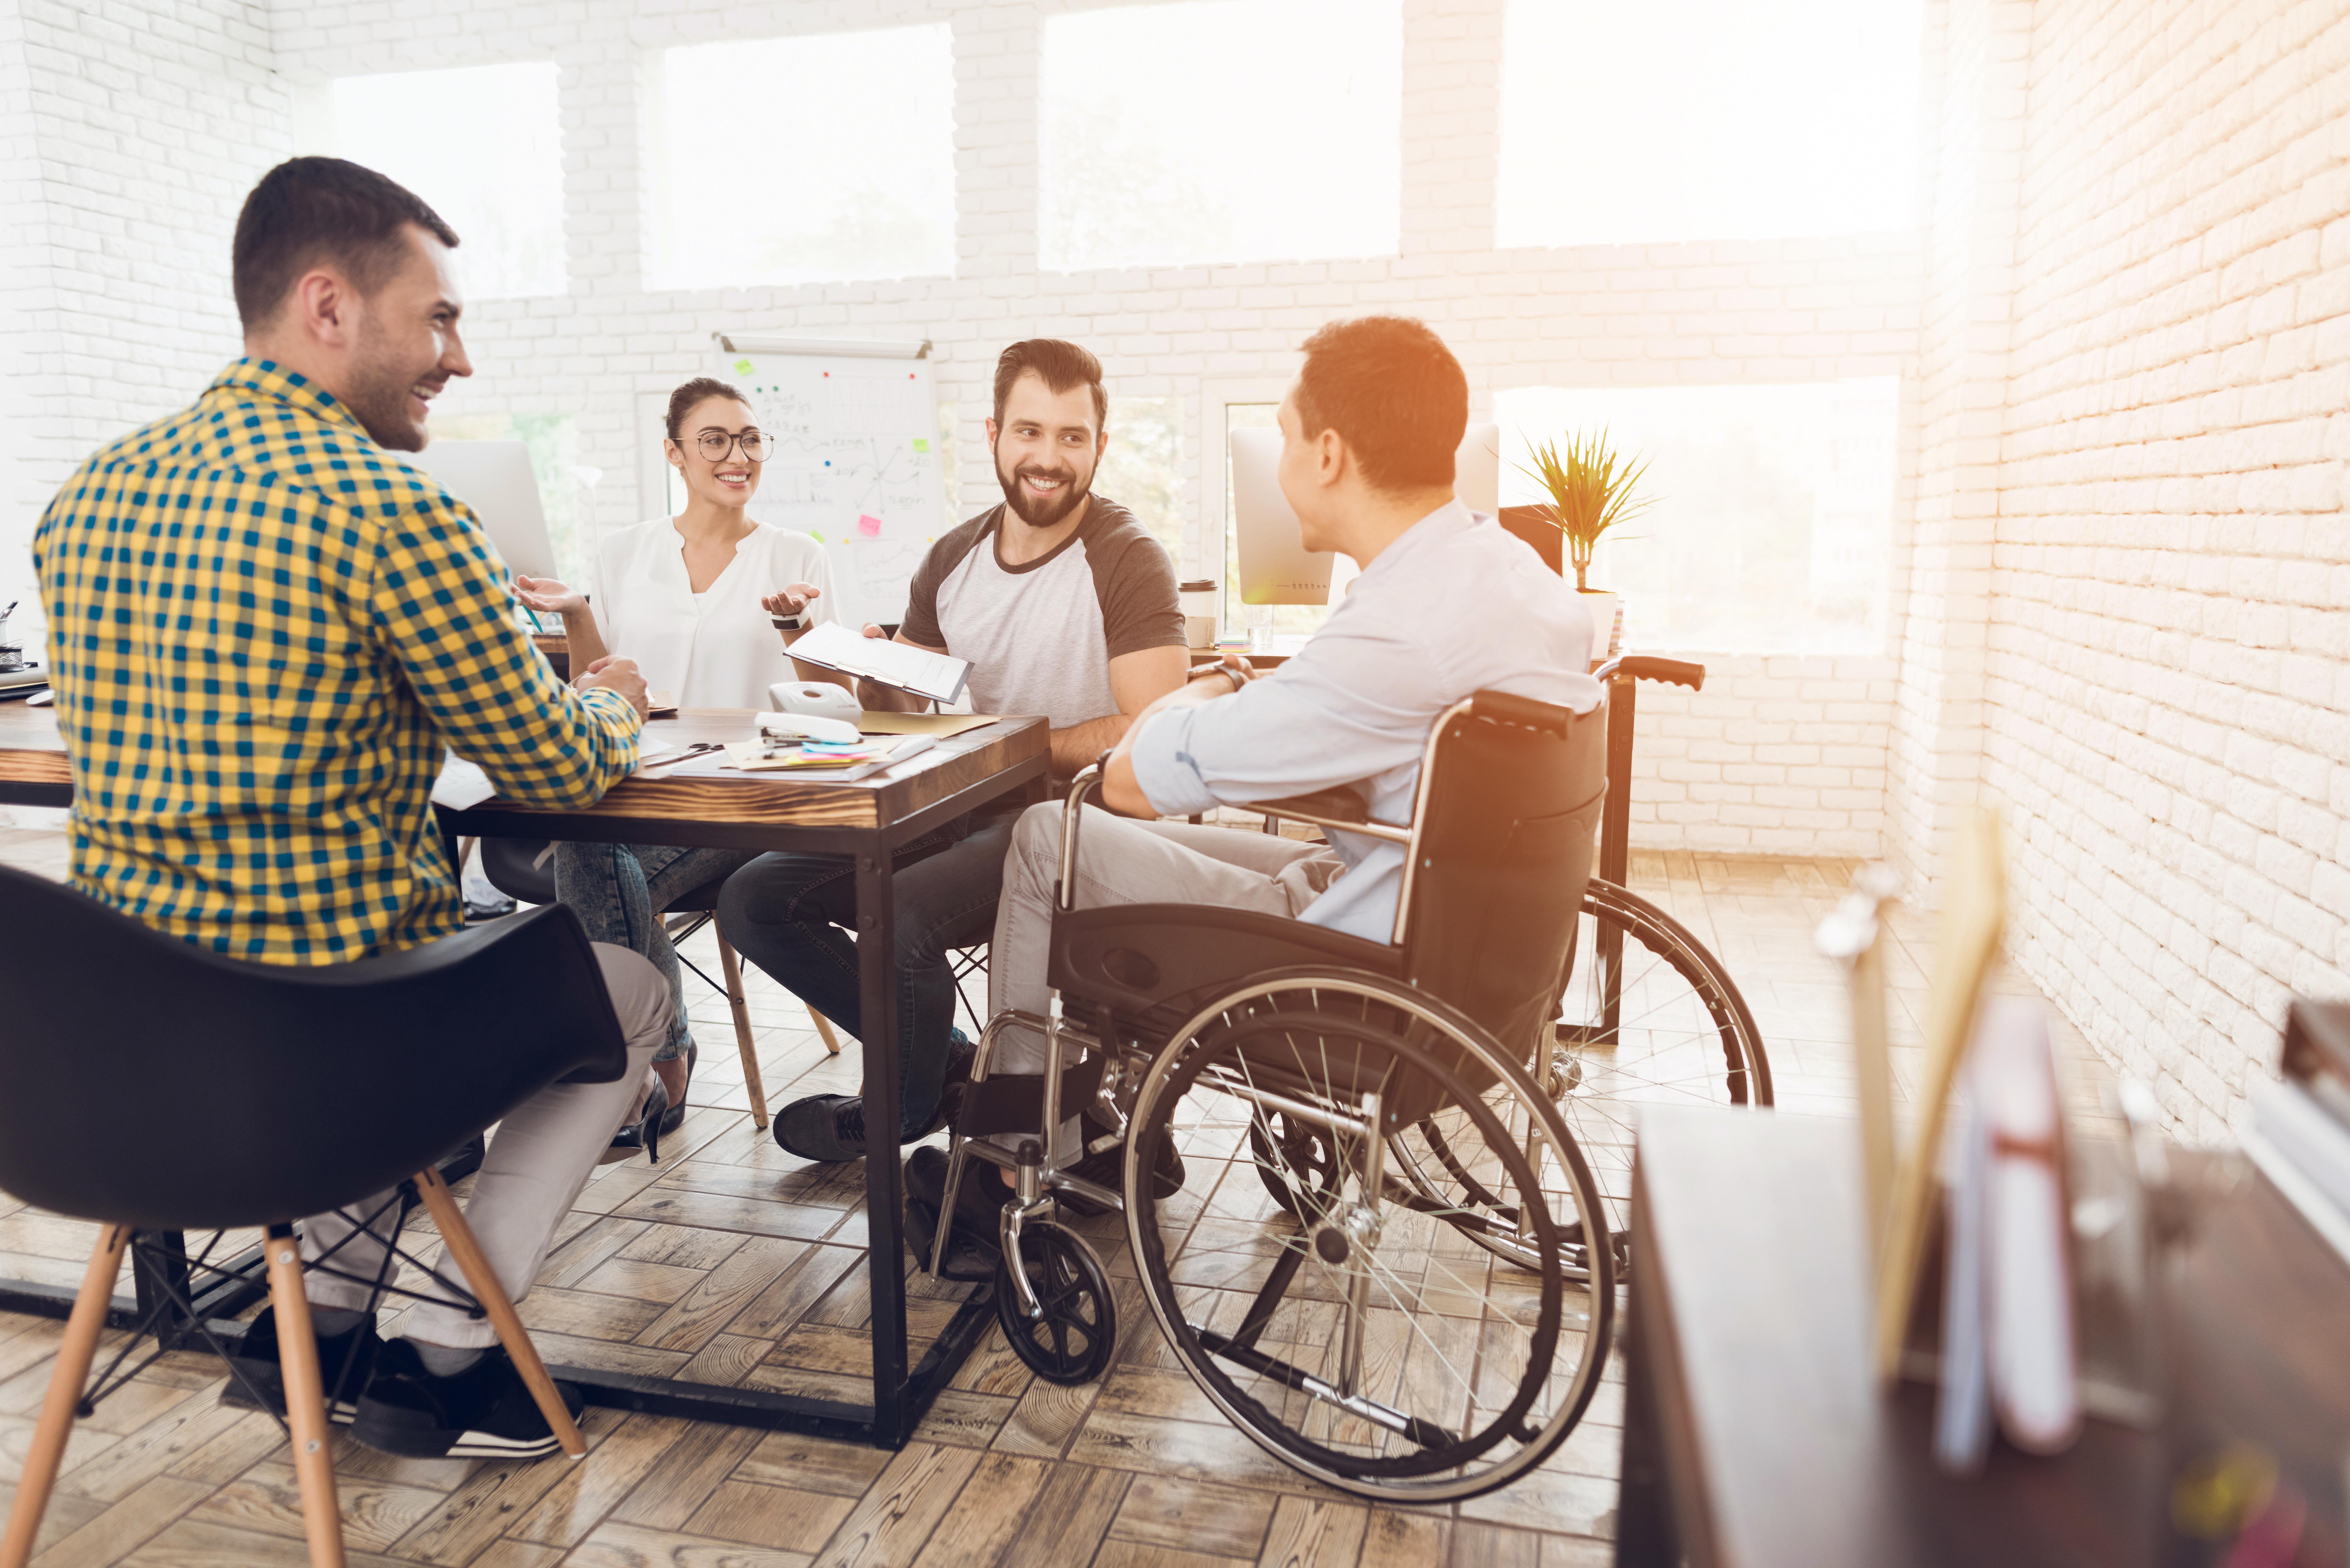 CollaborativeTeam Wheelchair ReasonableAccommodations